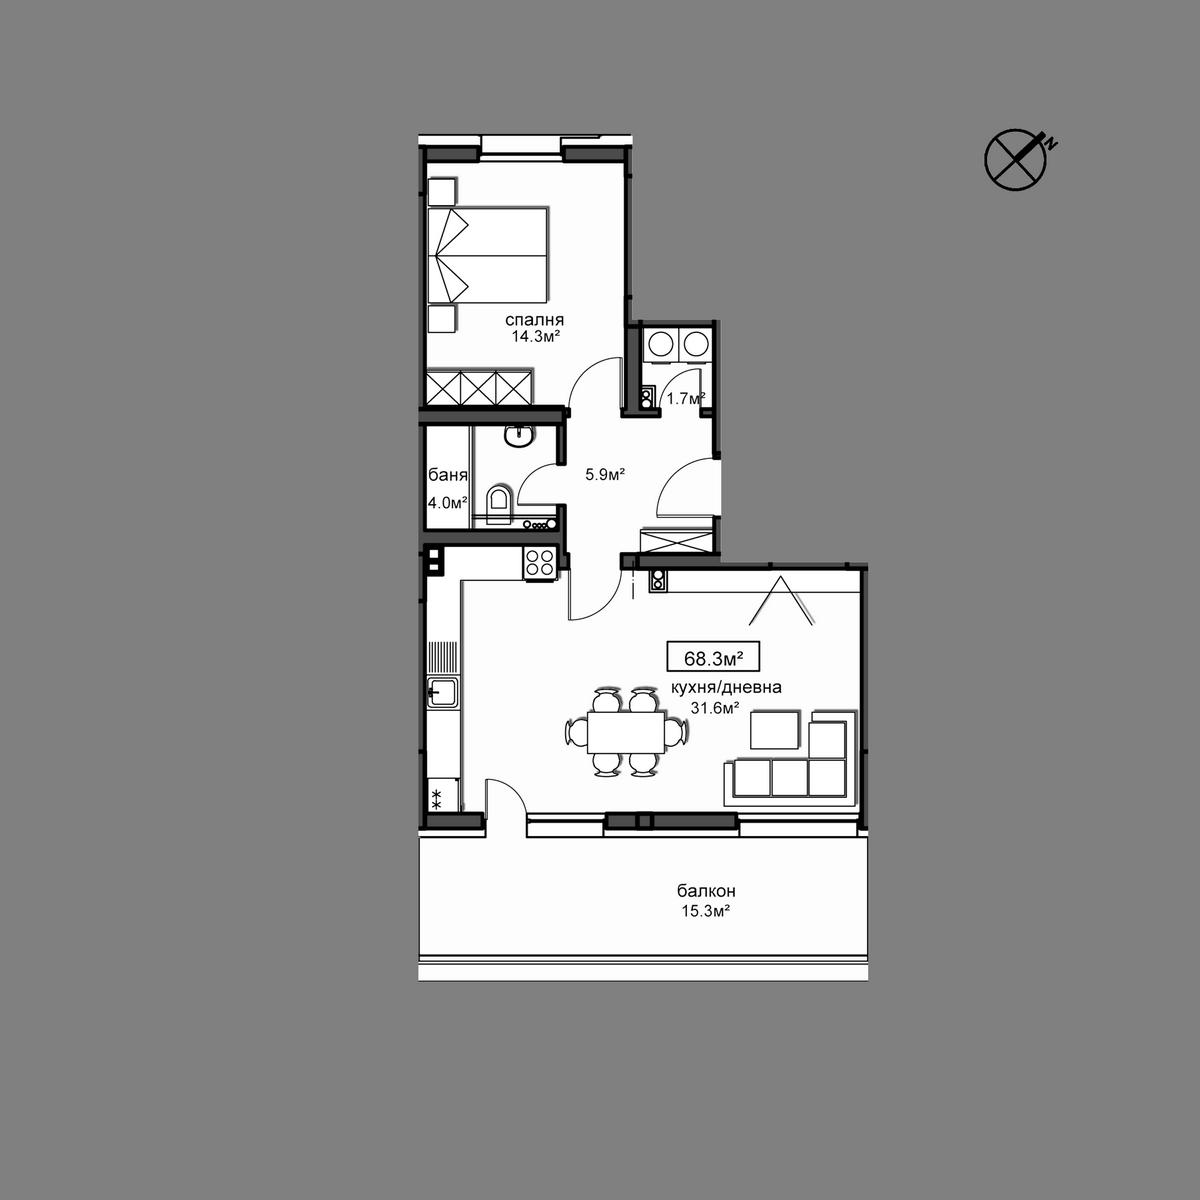 Продава апартамент - Апартамент Б22